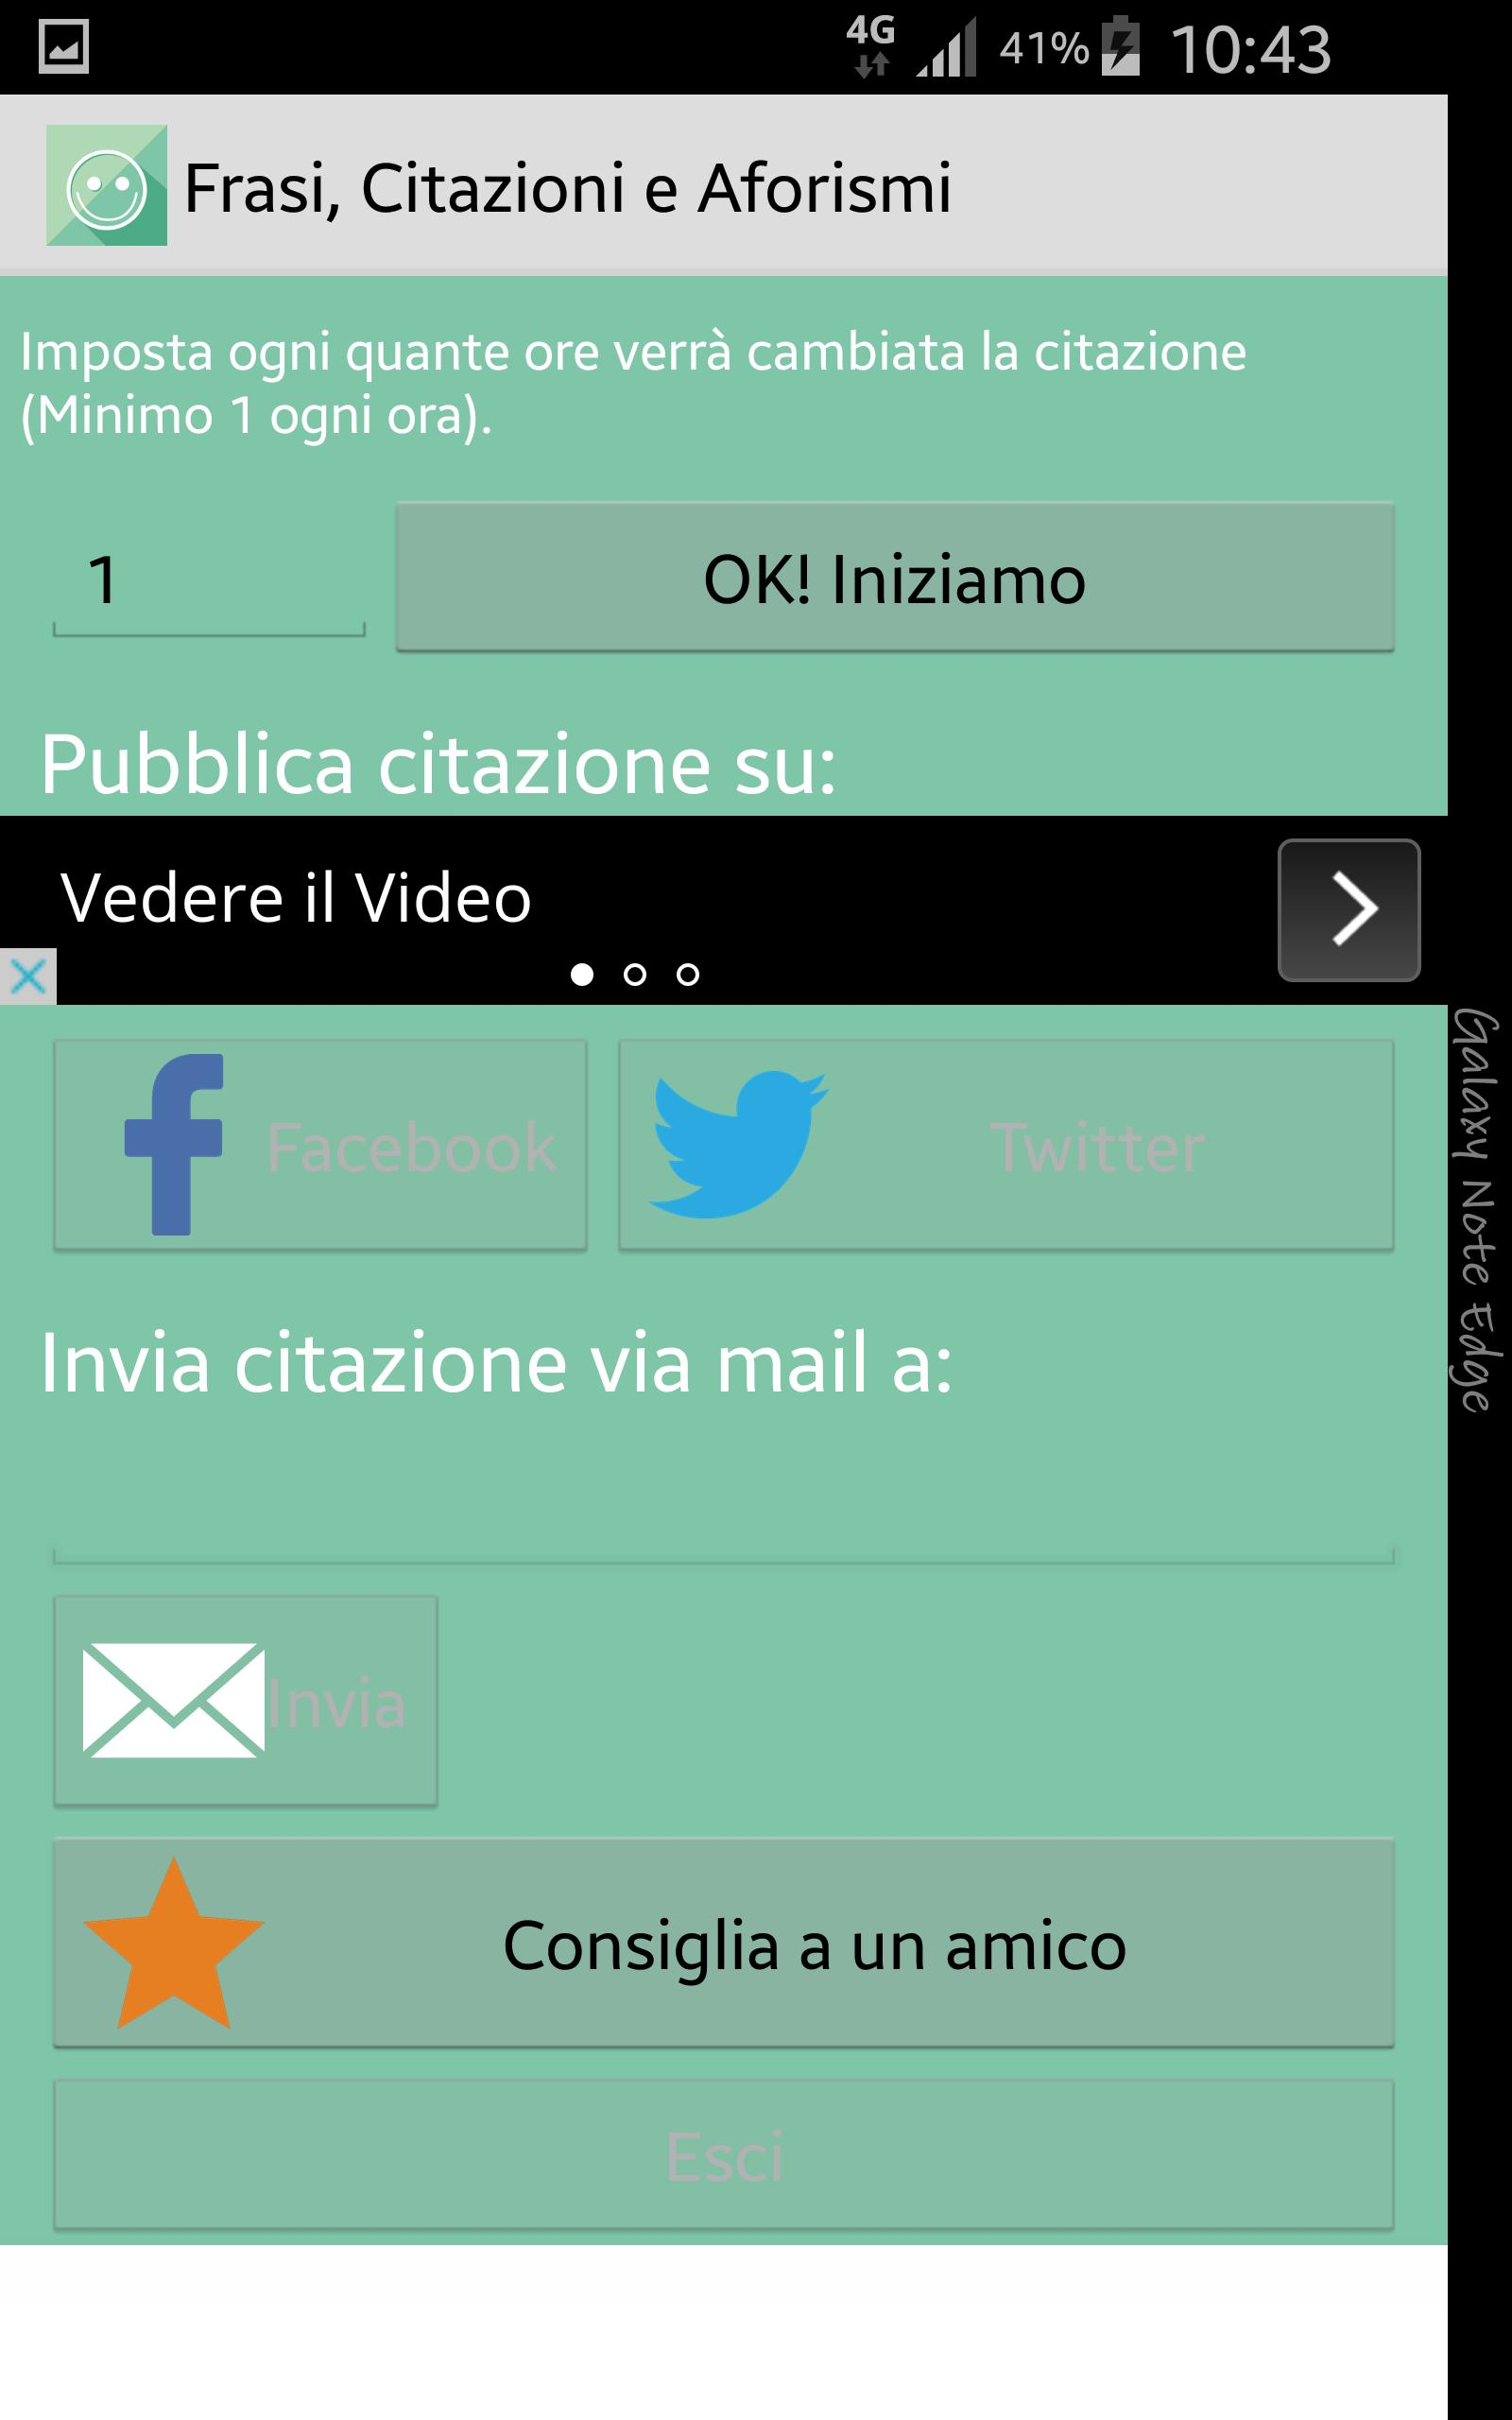 Frasi Citazioni E Aforismi For Android Apk Download